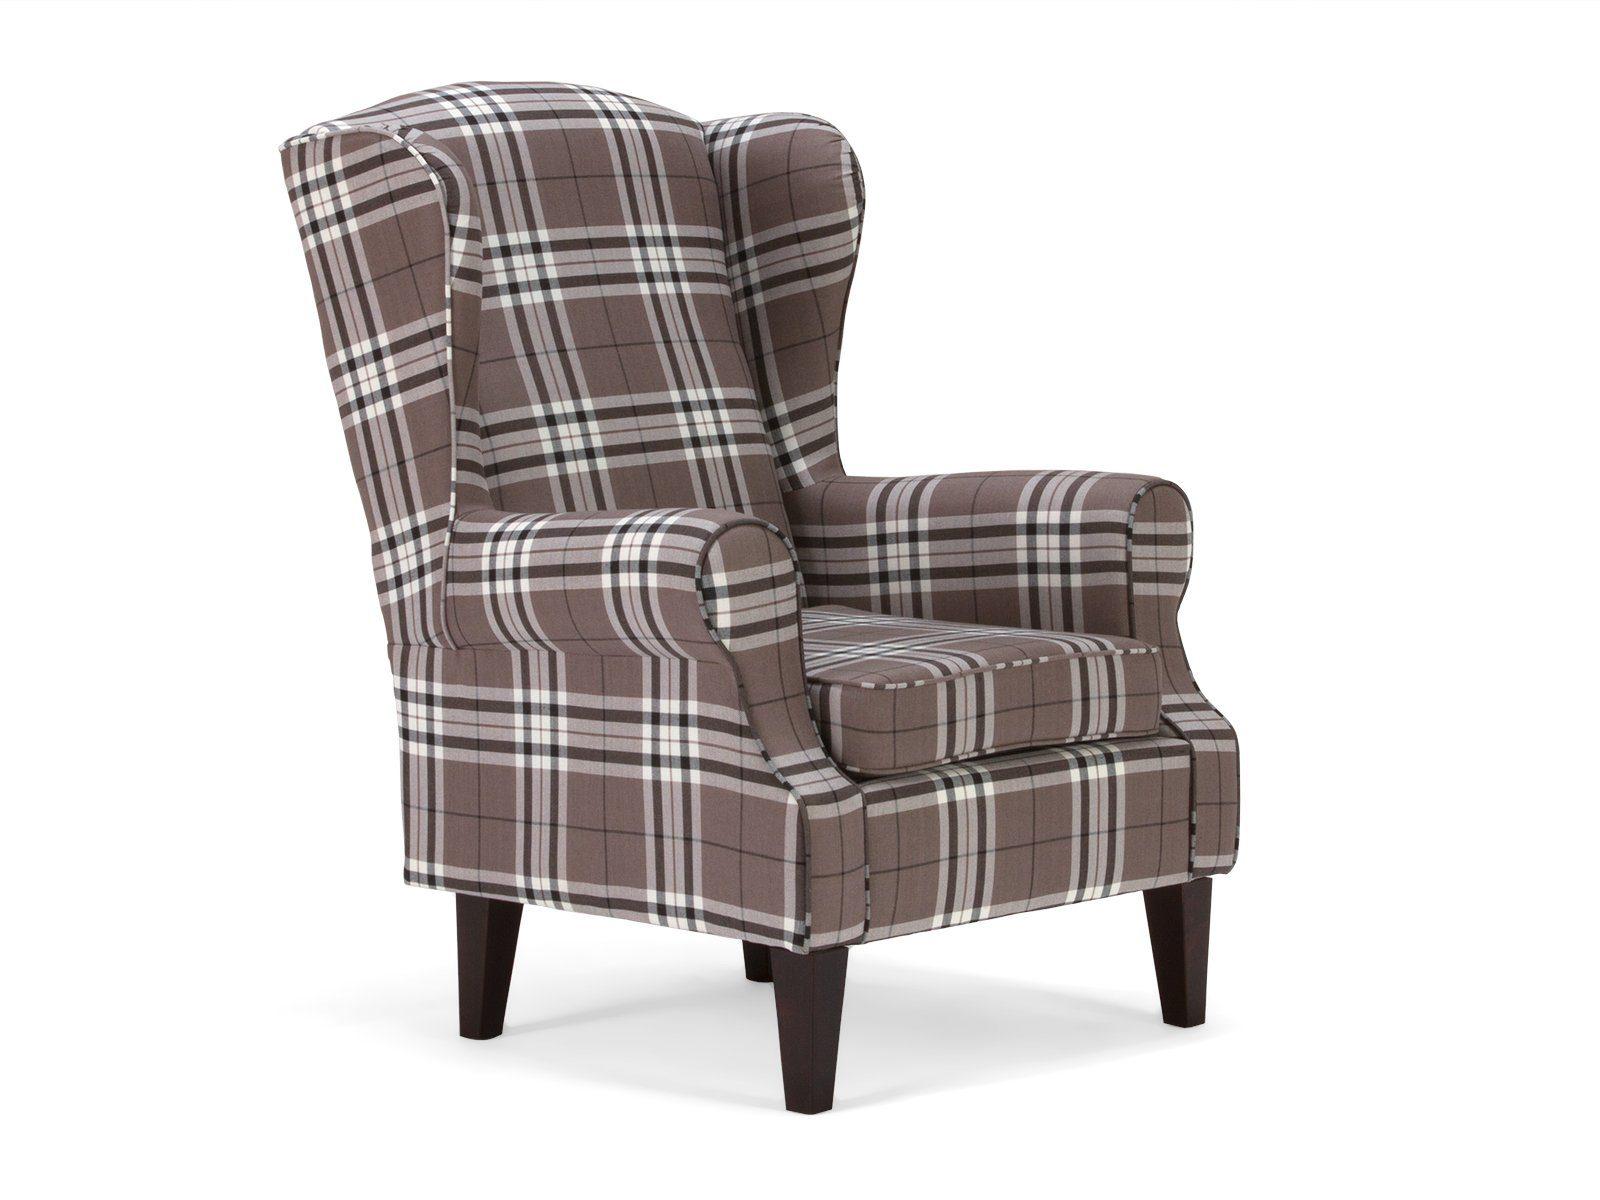 massivum Sessel aus Flachgewebe »Avalon«